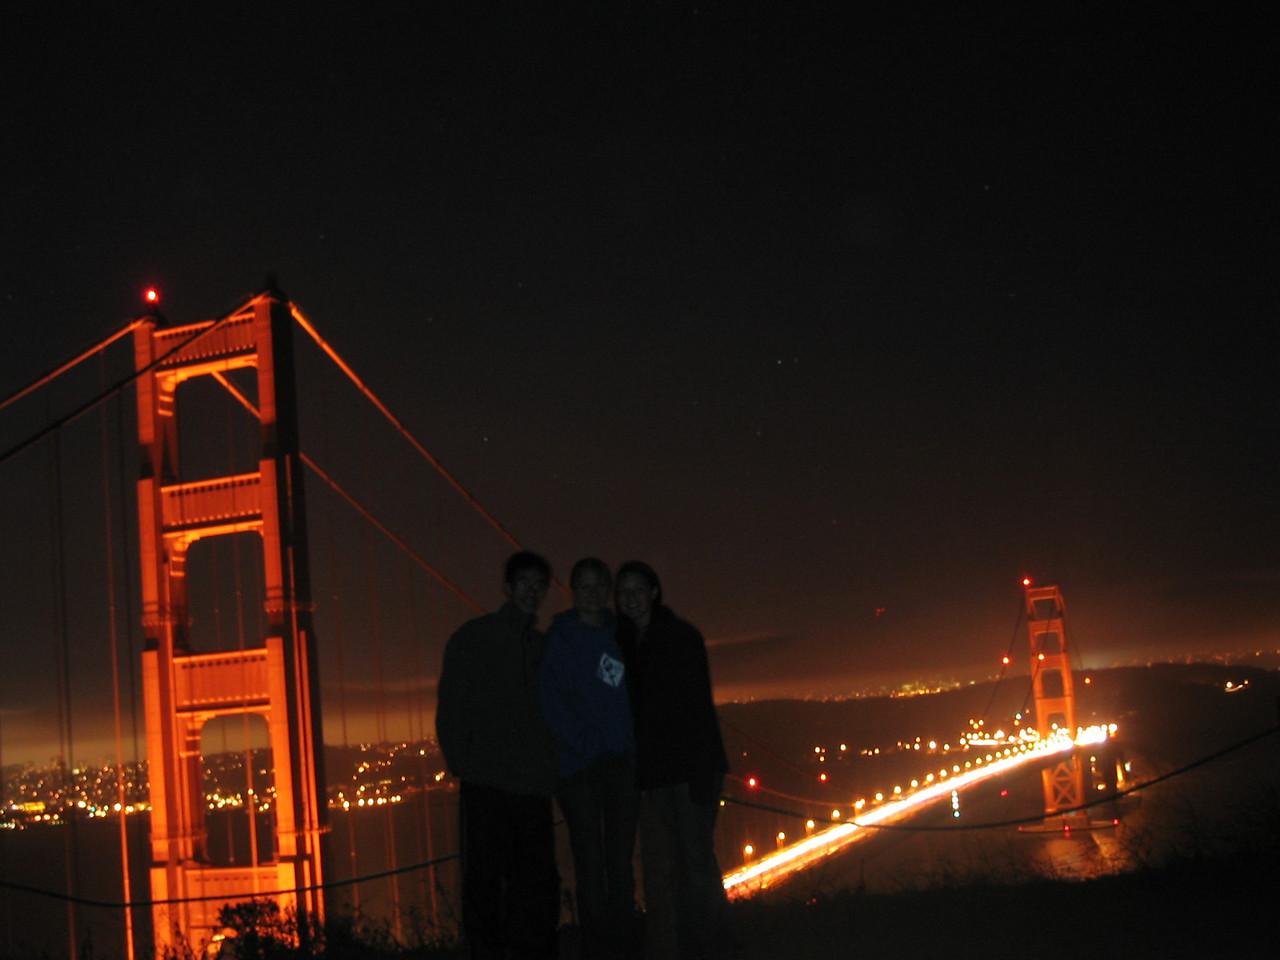 2004 07 12 Monday - Ben, Melody, & Carrie @ Golden Gate Bridge